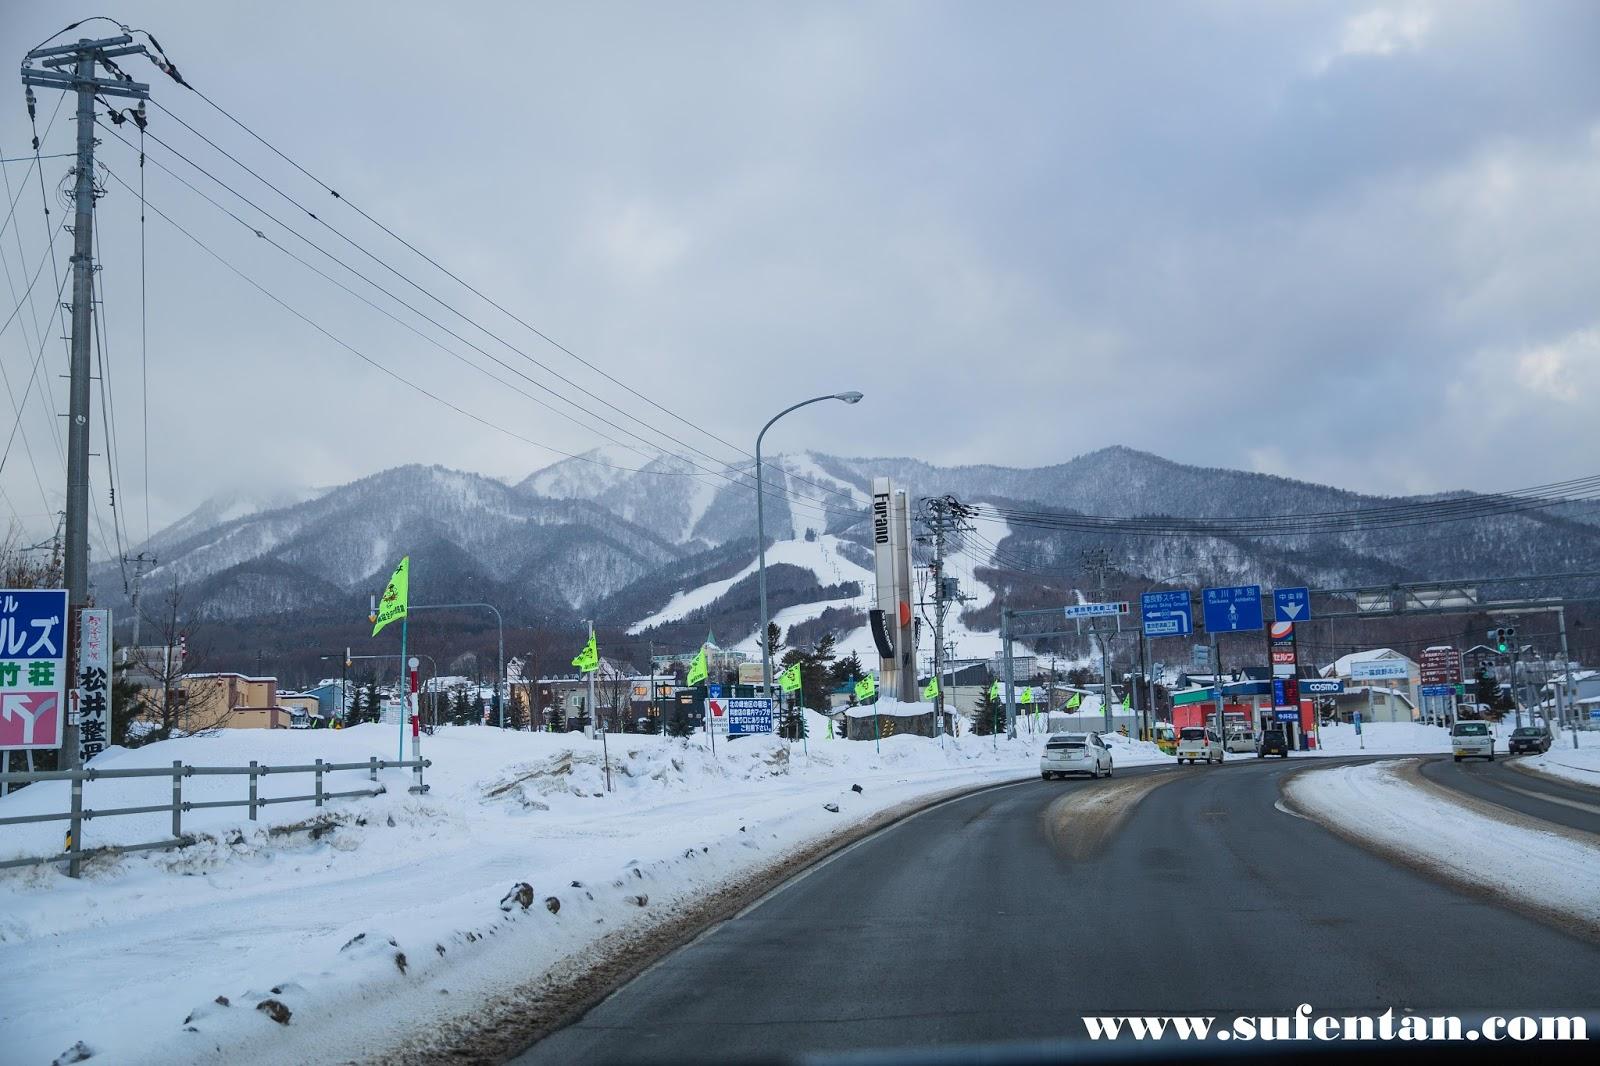 Car Rental Companies In Sapporo